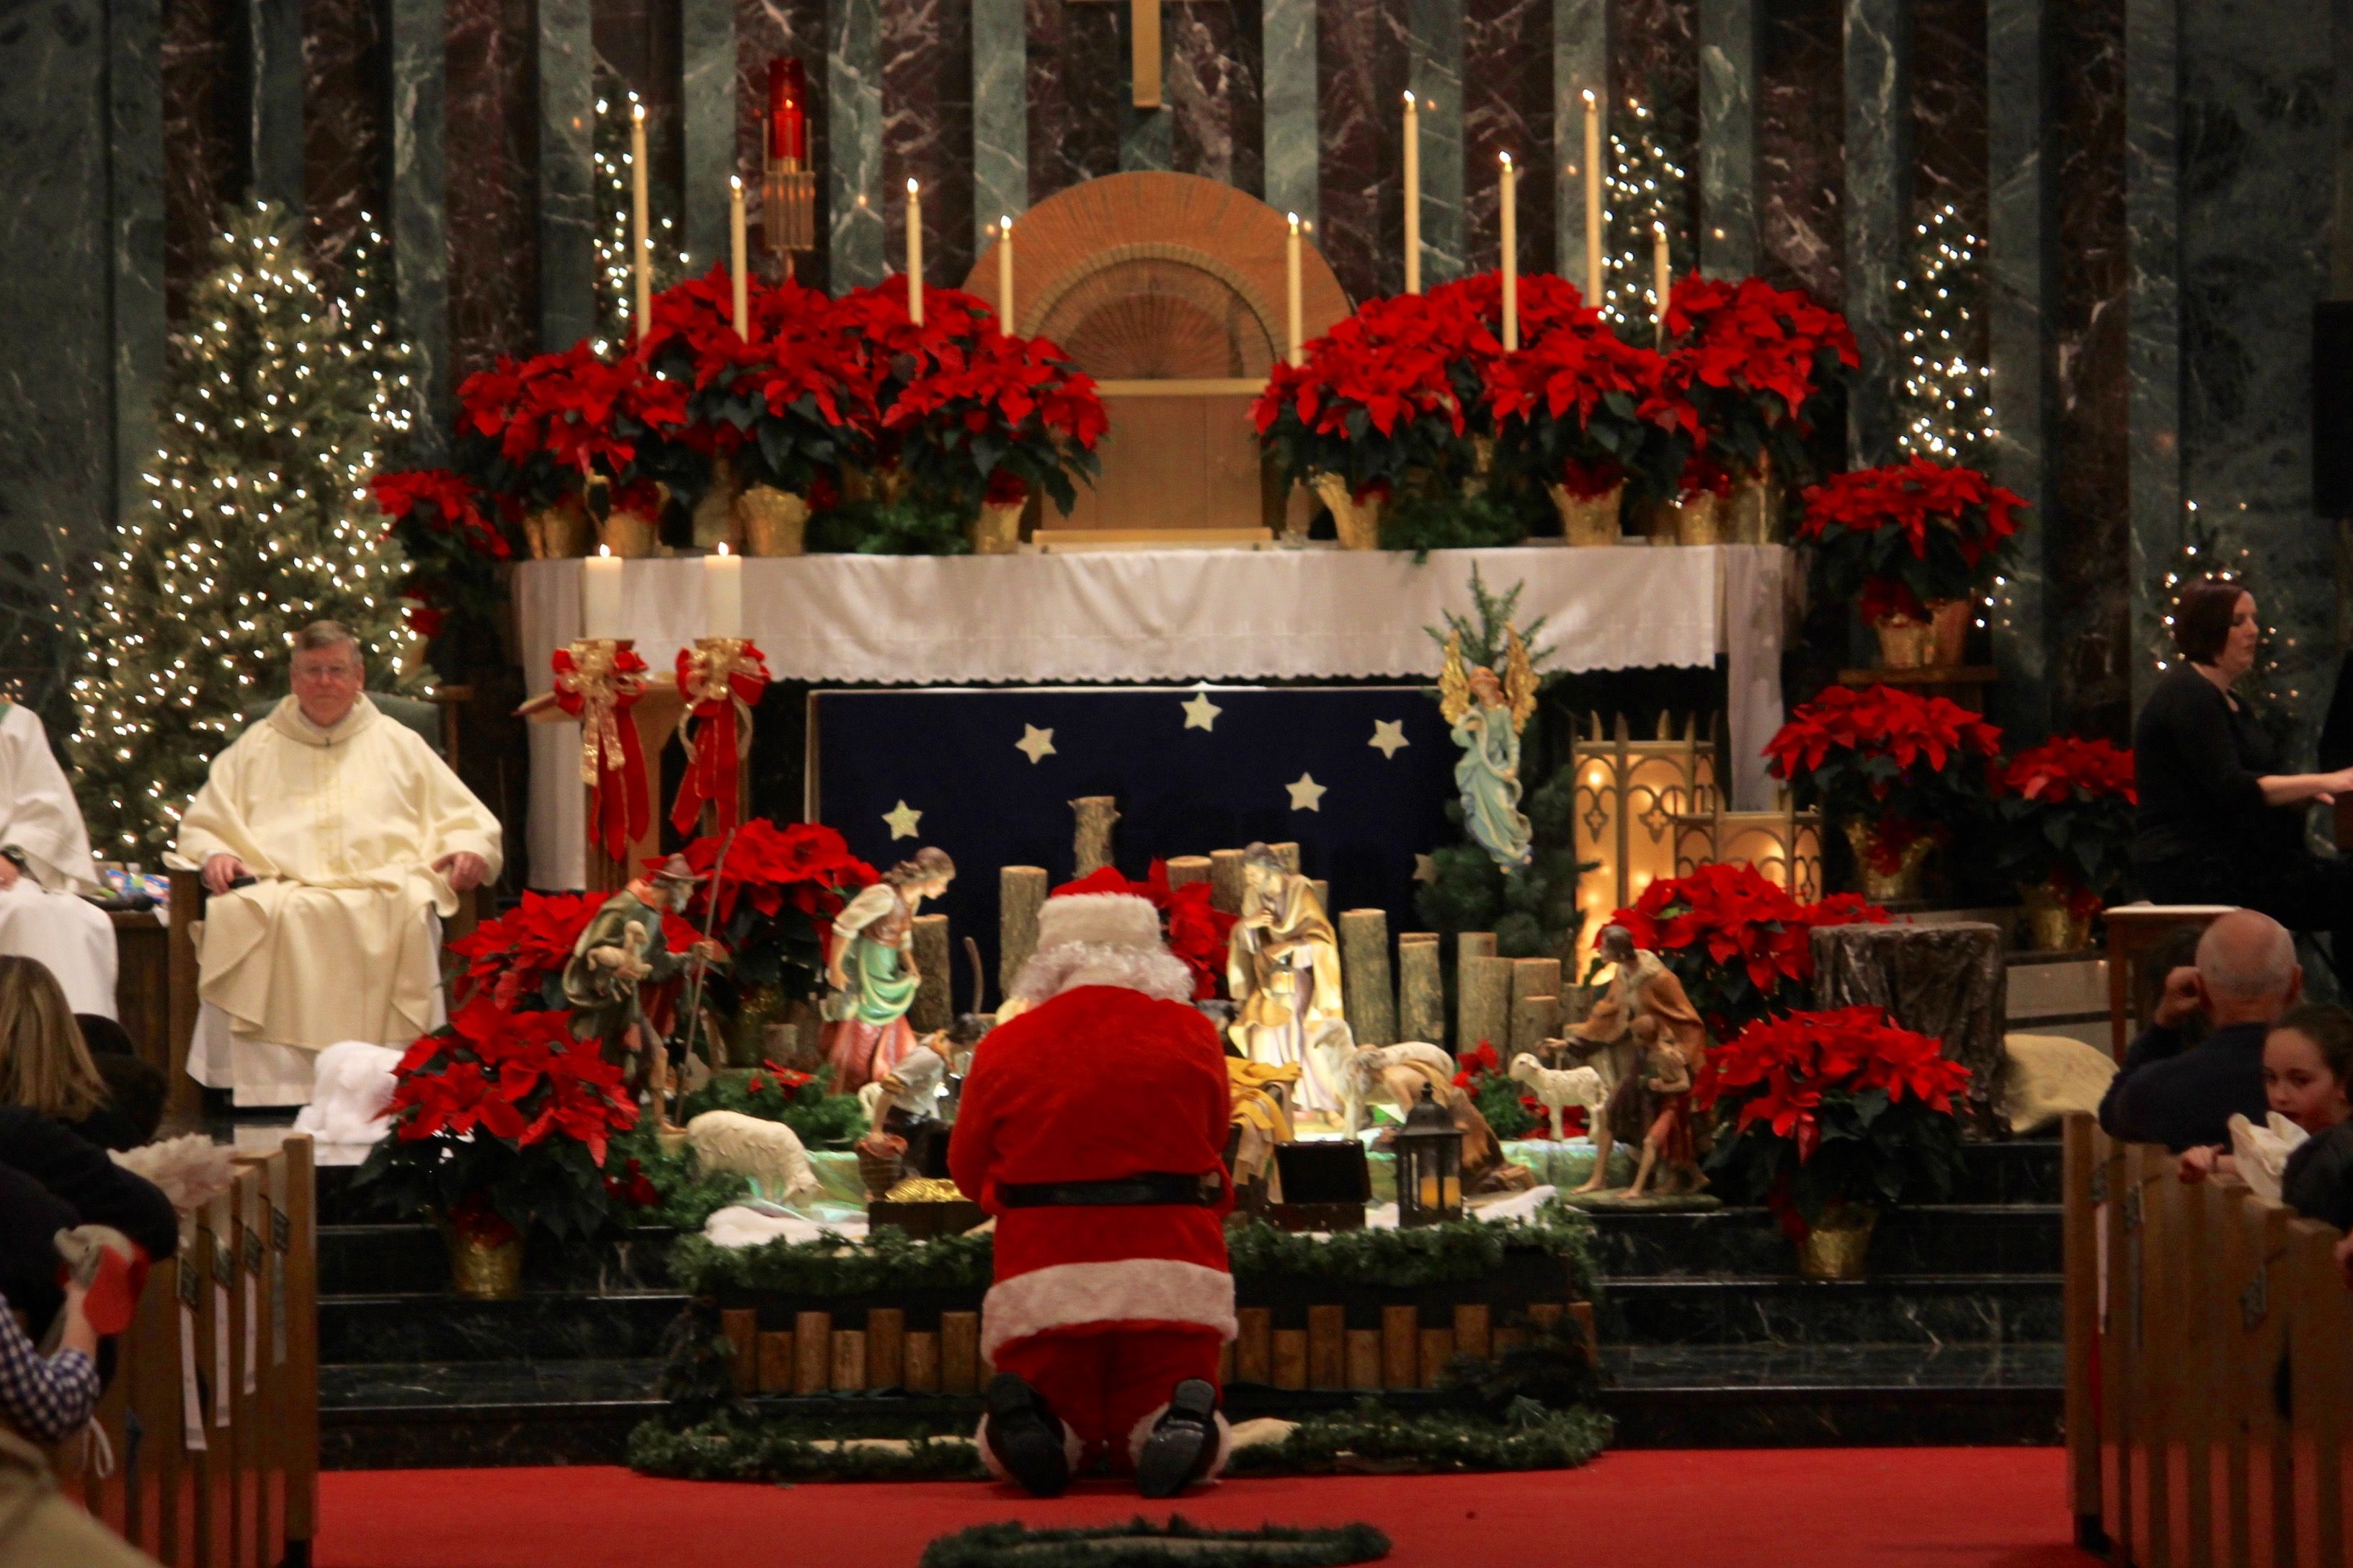 Christmas Eve Mass at St. John Vianney Catholic Church